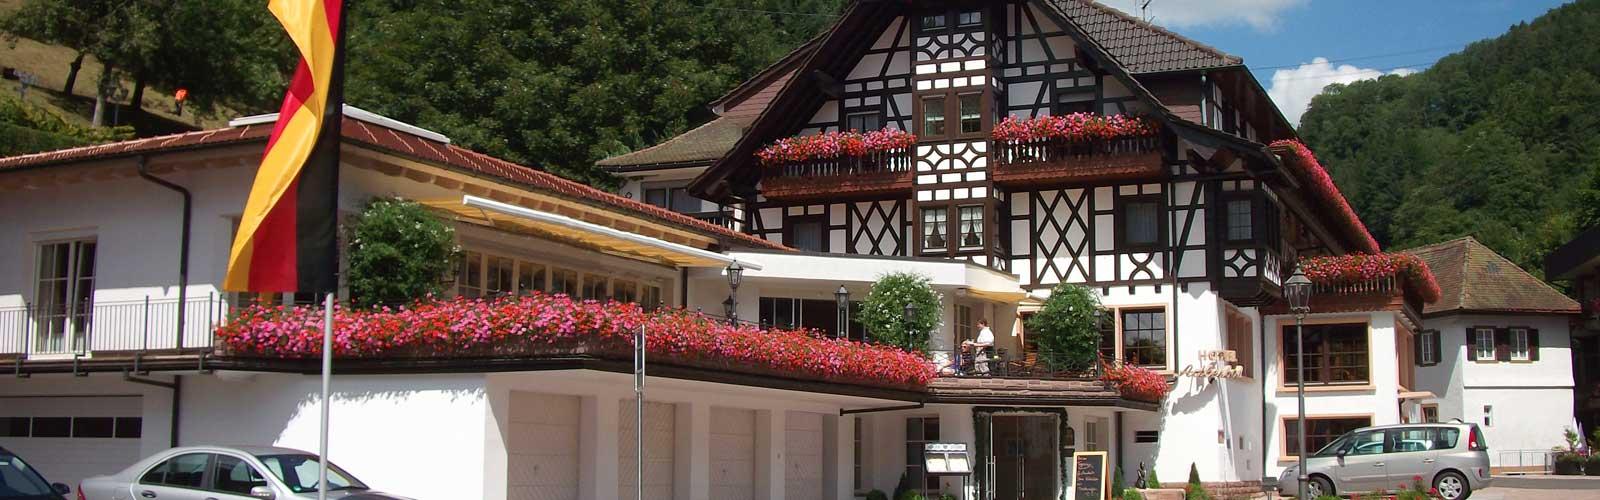 adlerbad_slider_home1_ret1